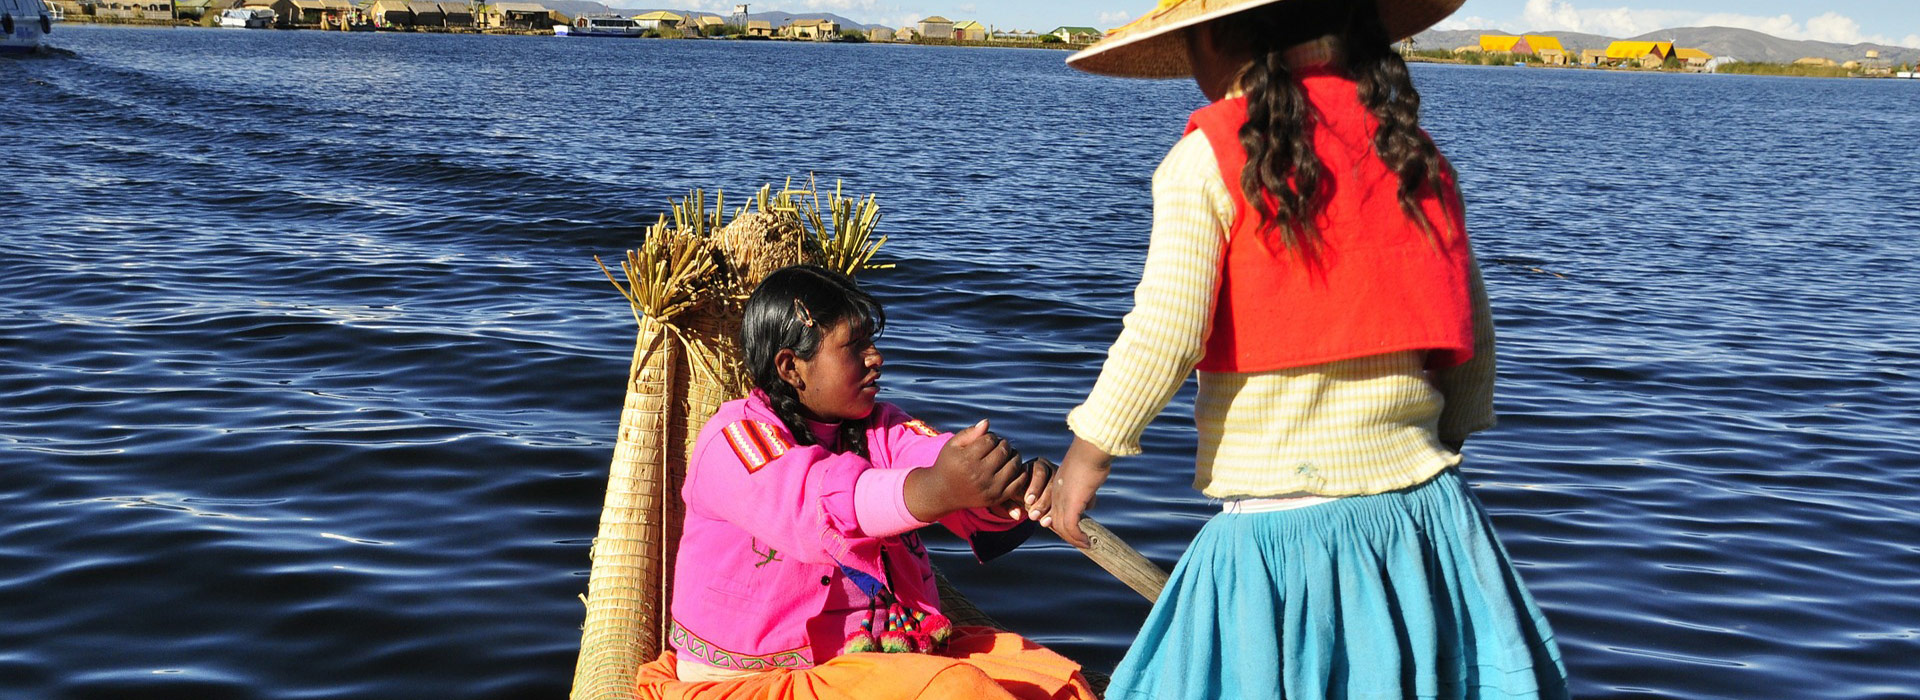 Bolivien Impression